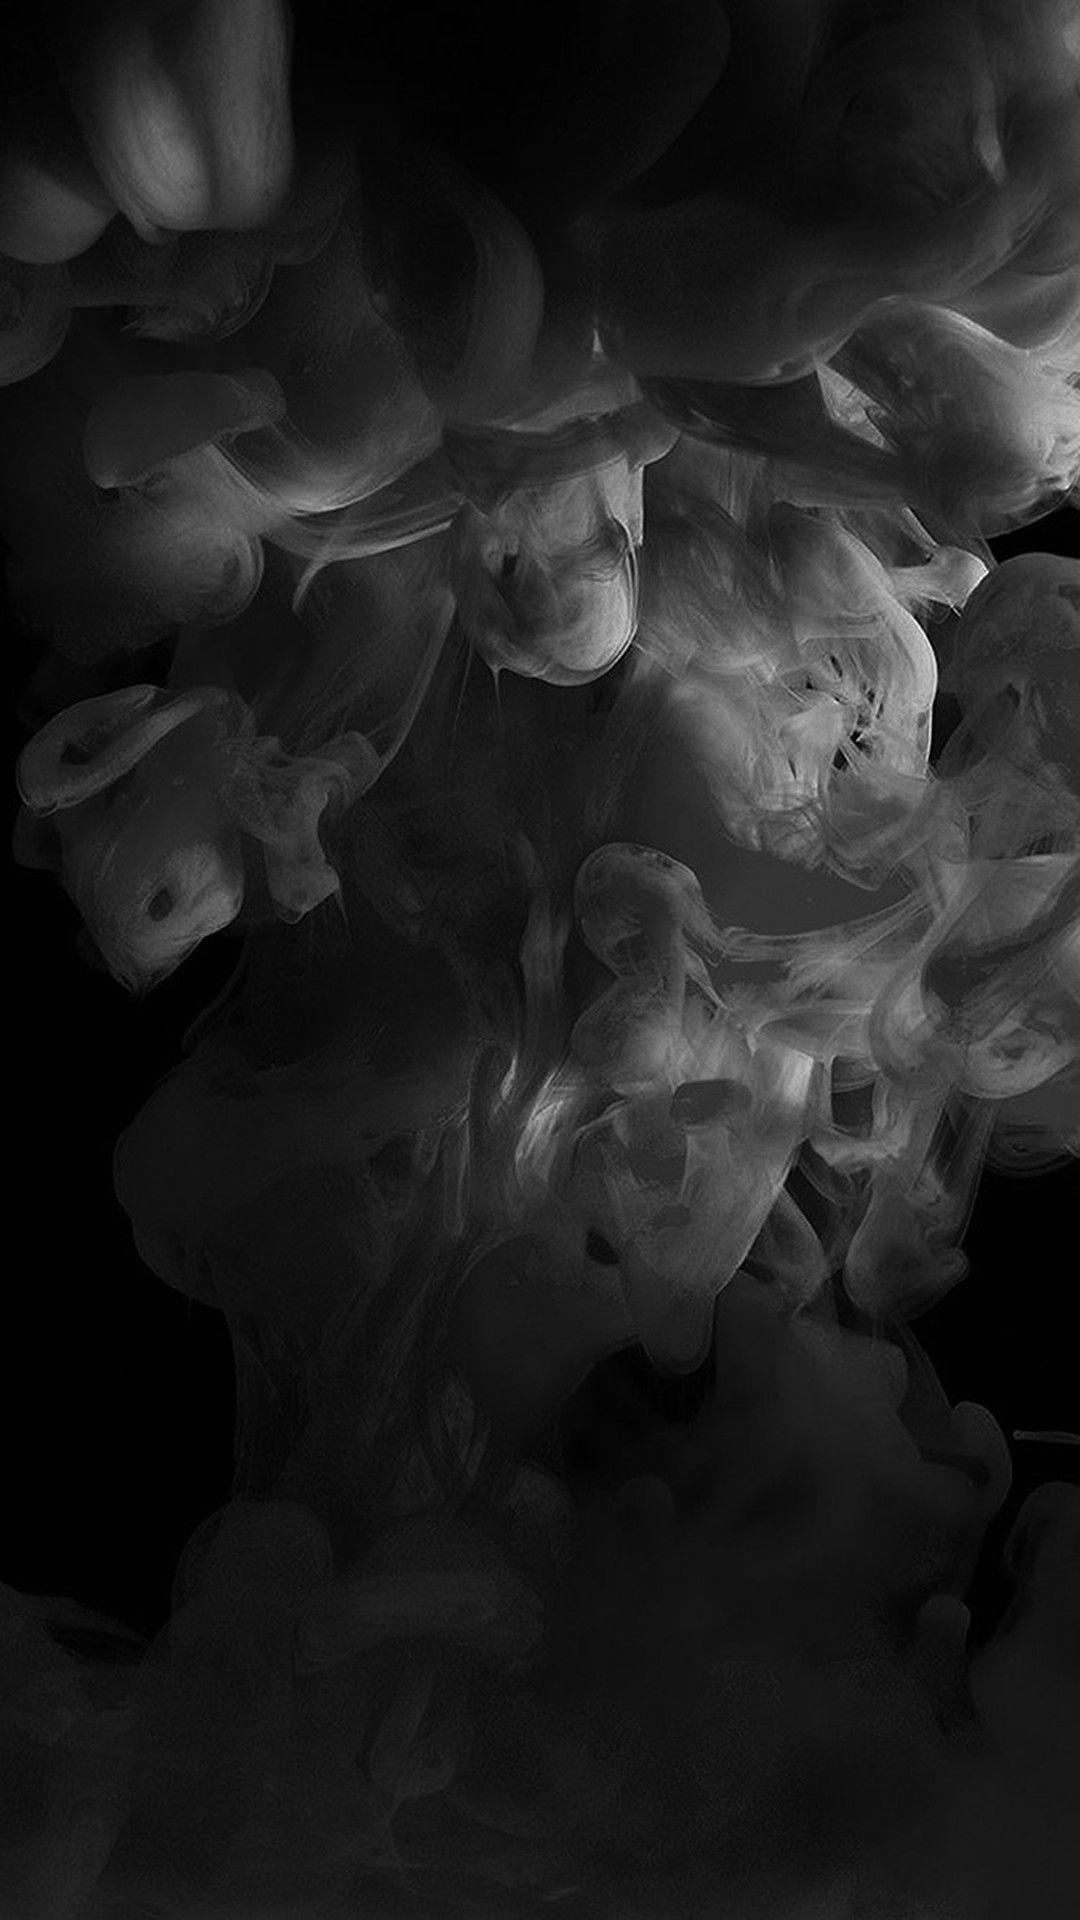 Smoke Wallpaper Hd For Iphone 1080x1920 Mobile Smoke Wallpaper Iphone Wallpaper Smoke Dark Wallpaper Iphone